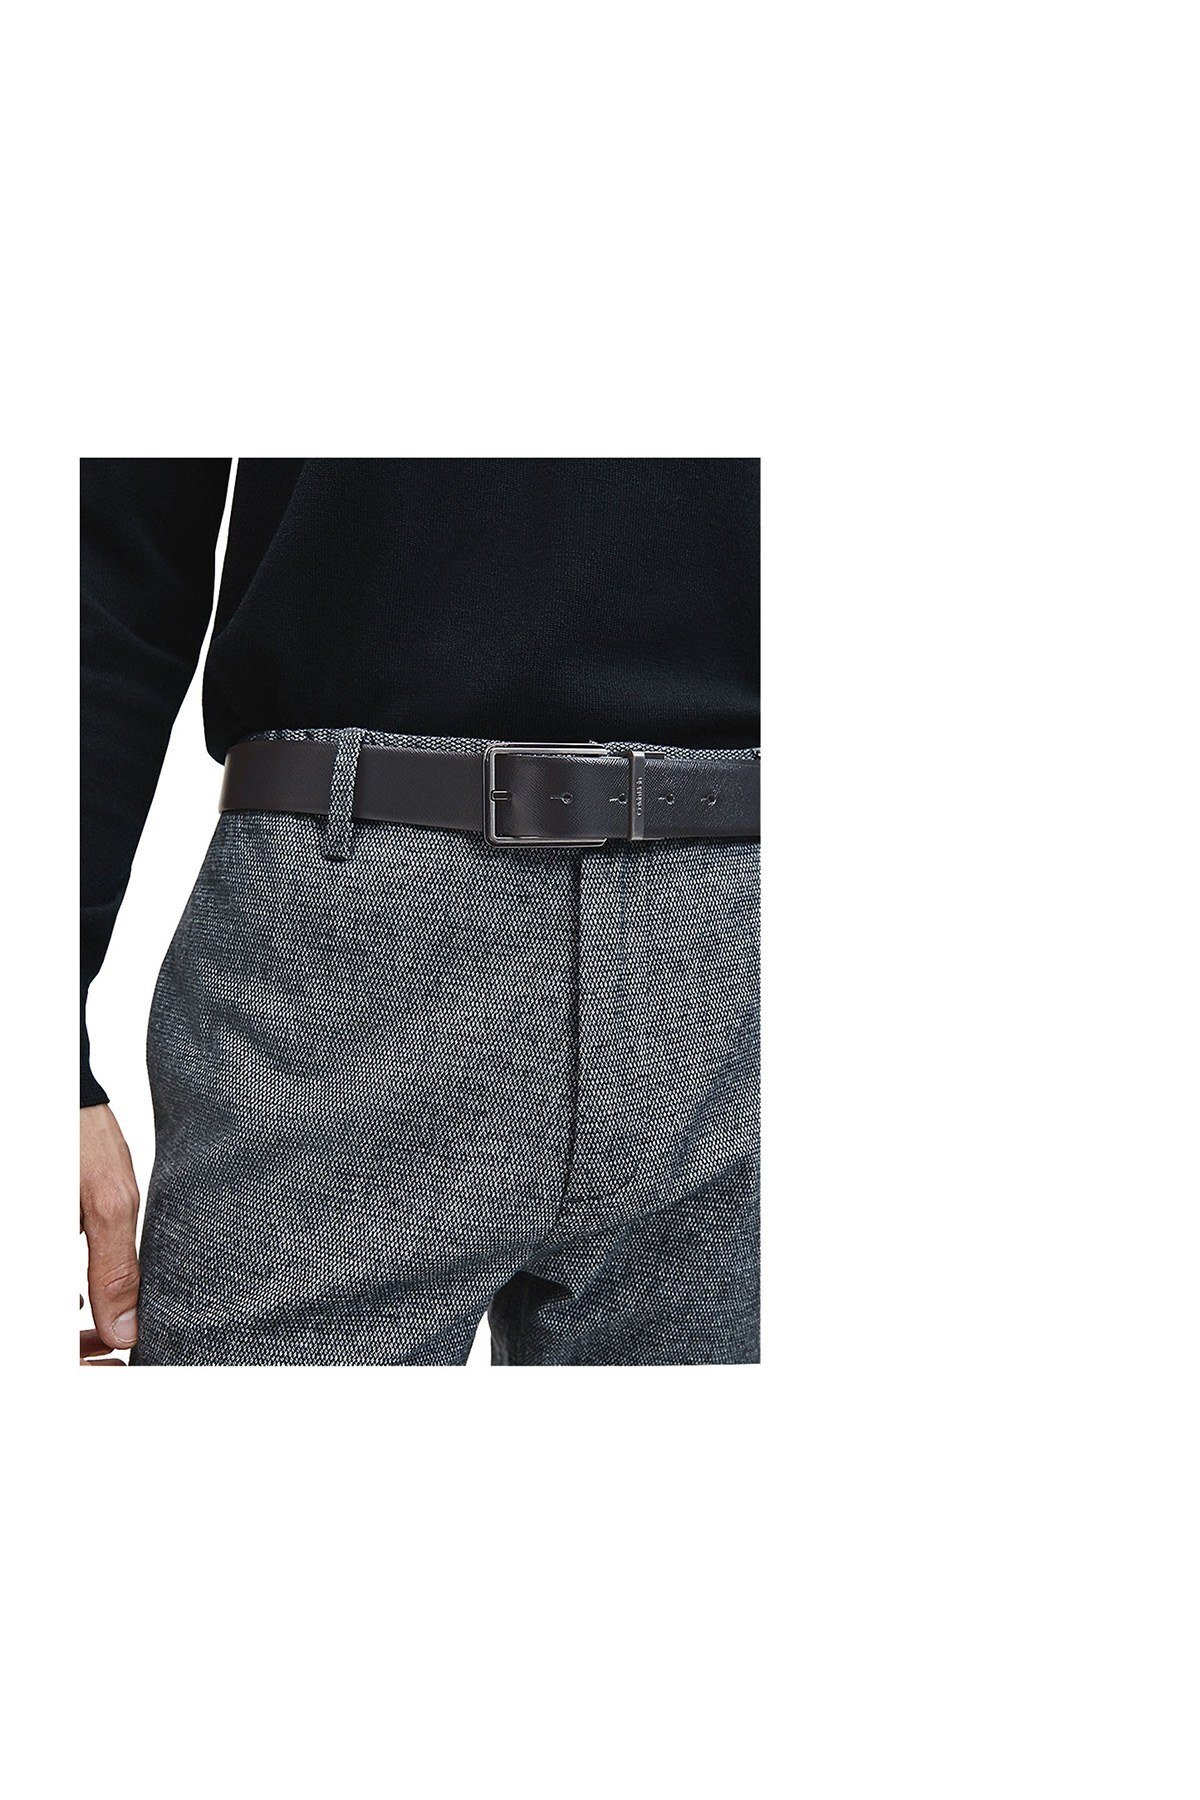 Calvin Klein İki Tokalı Deri Erkek Kemer K50K506117 BAX SİYAH